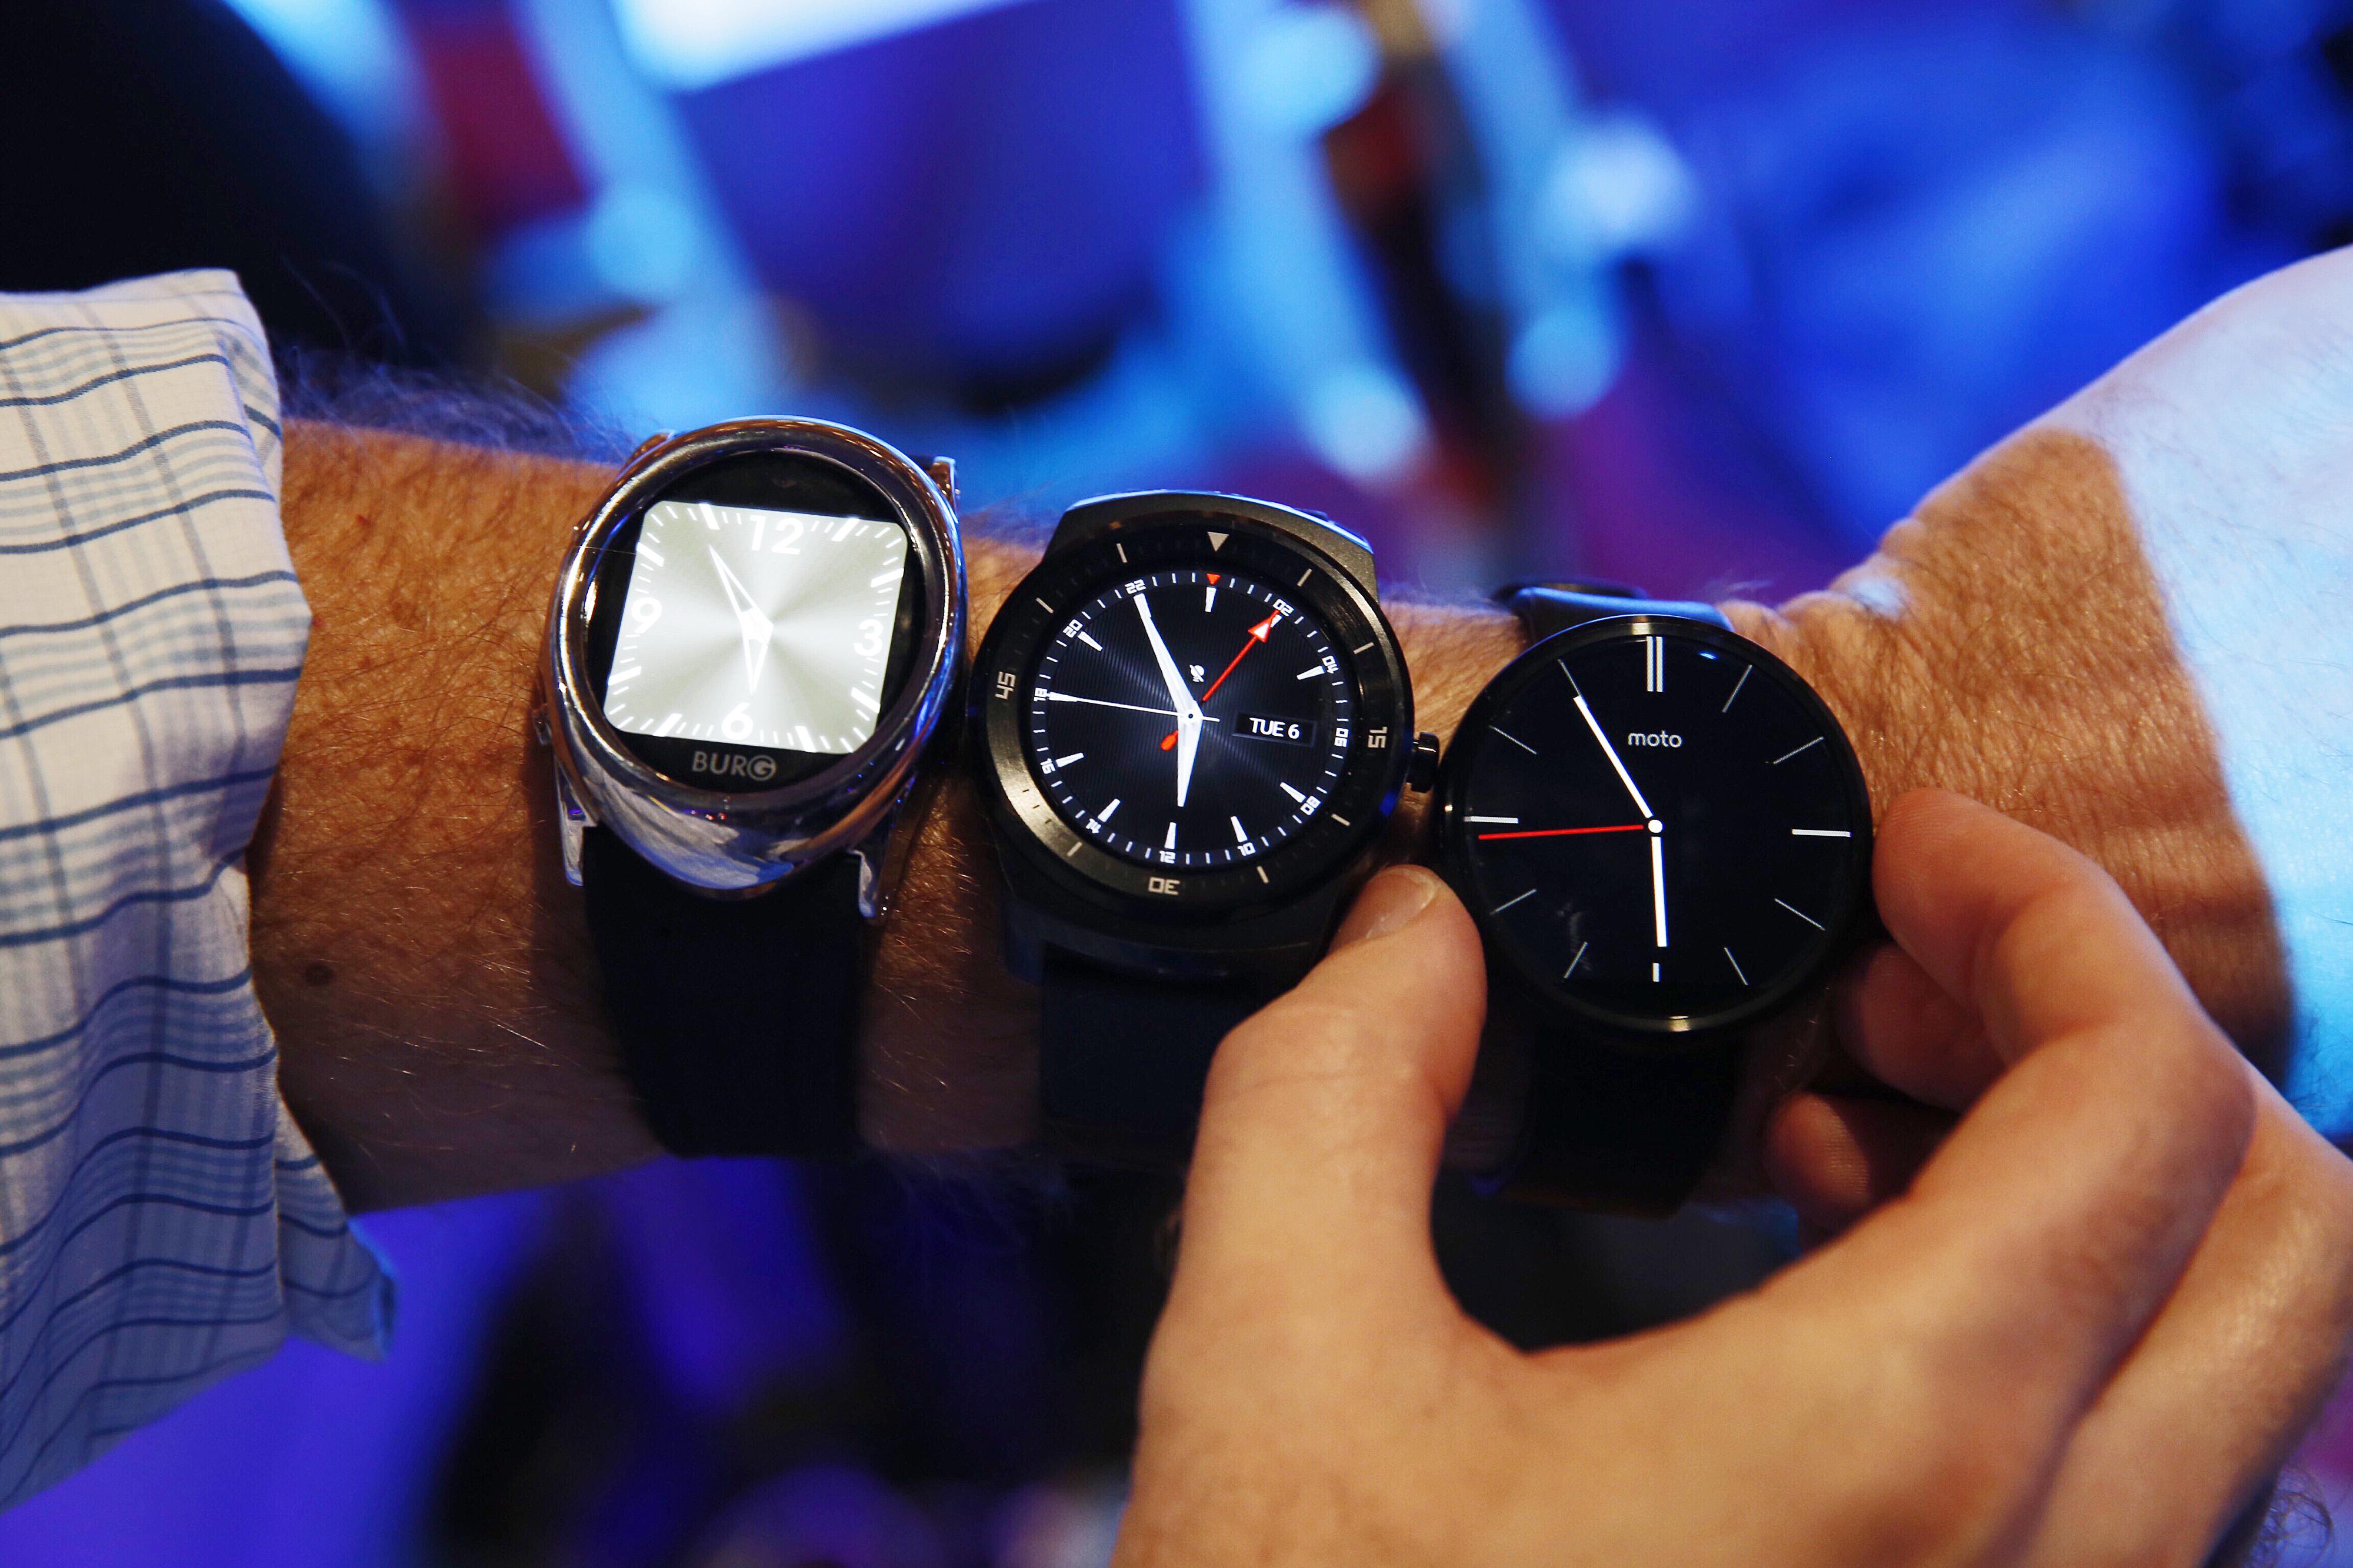 Burg 12, LG G Watch R and Moto 360